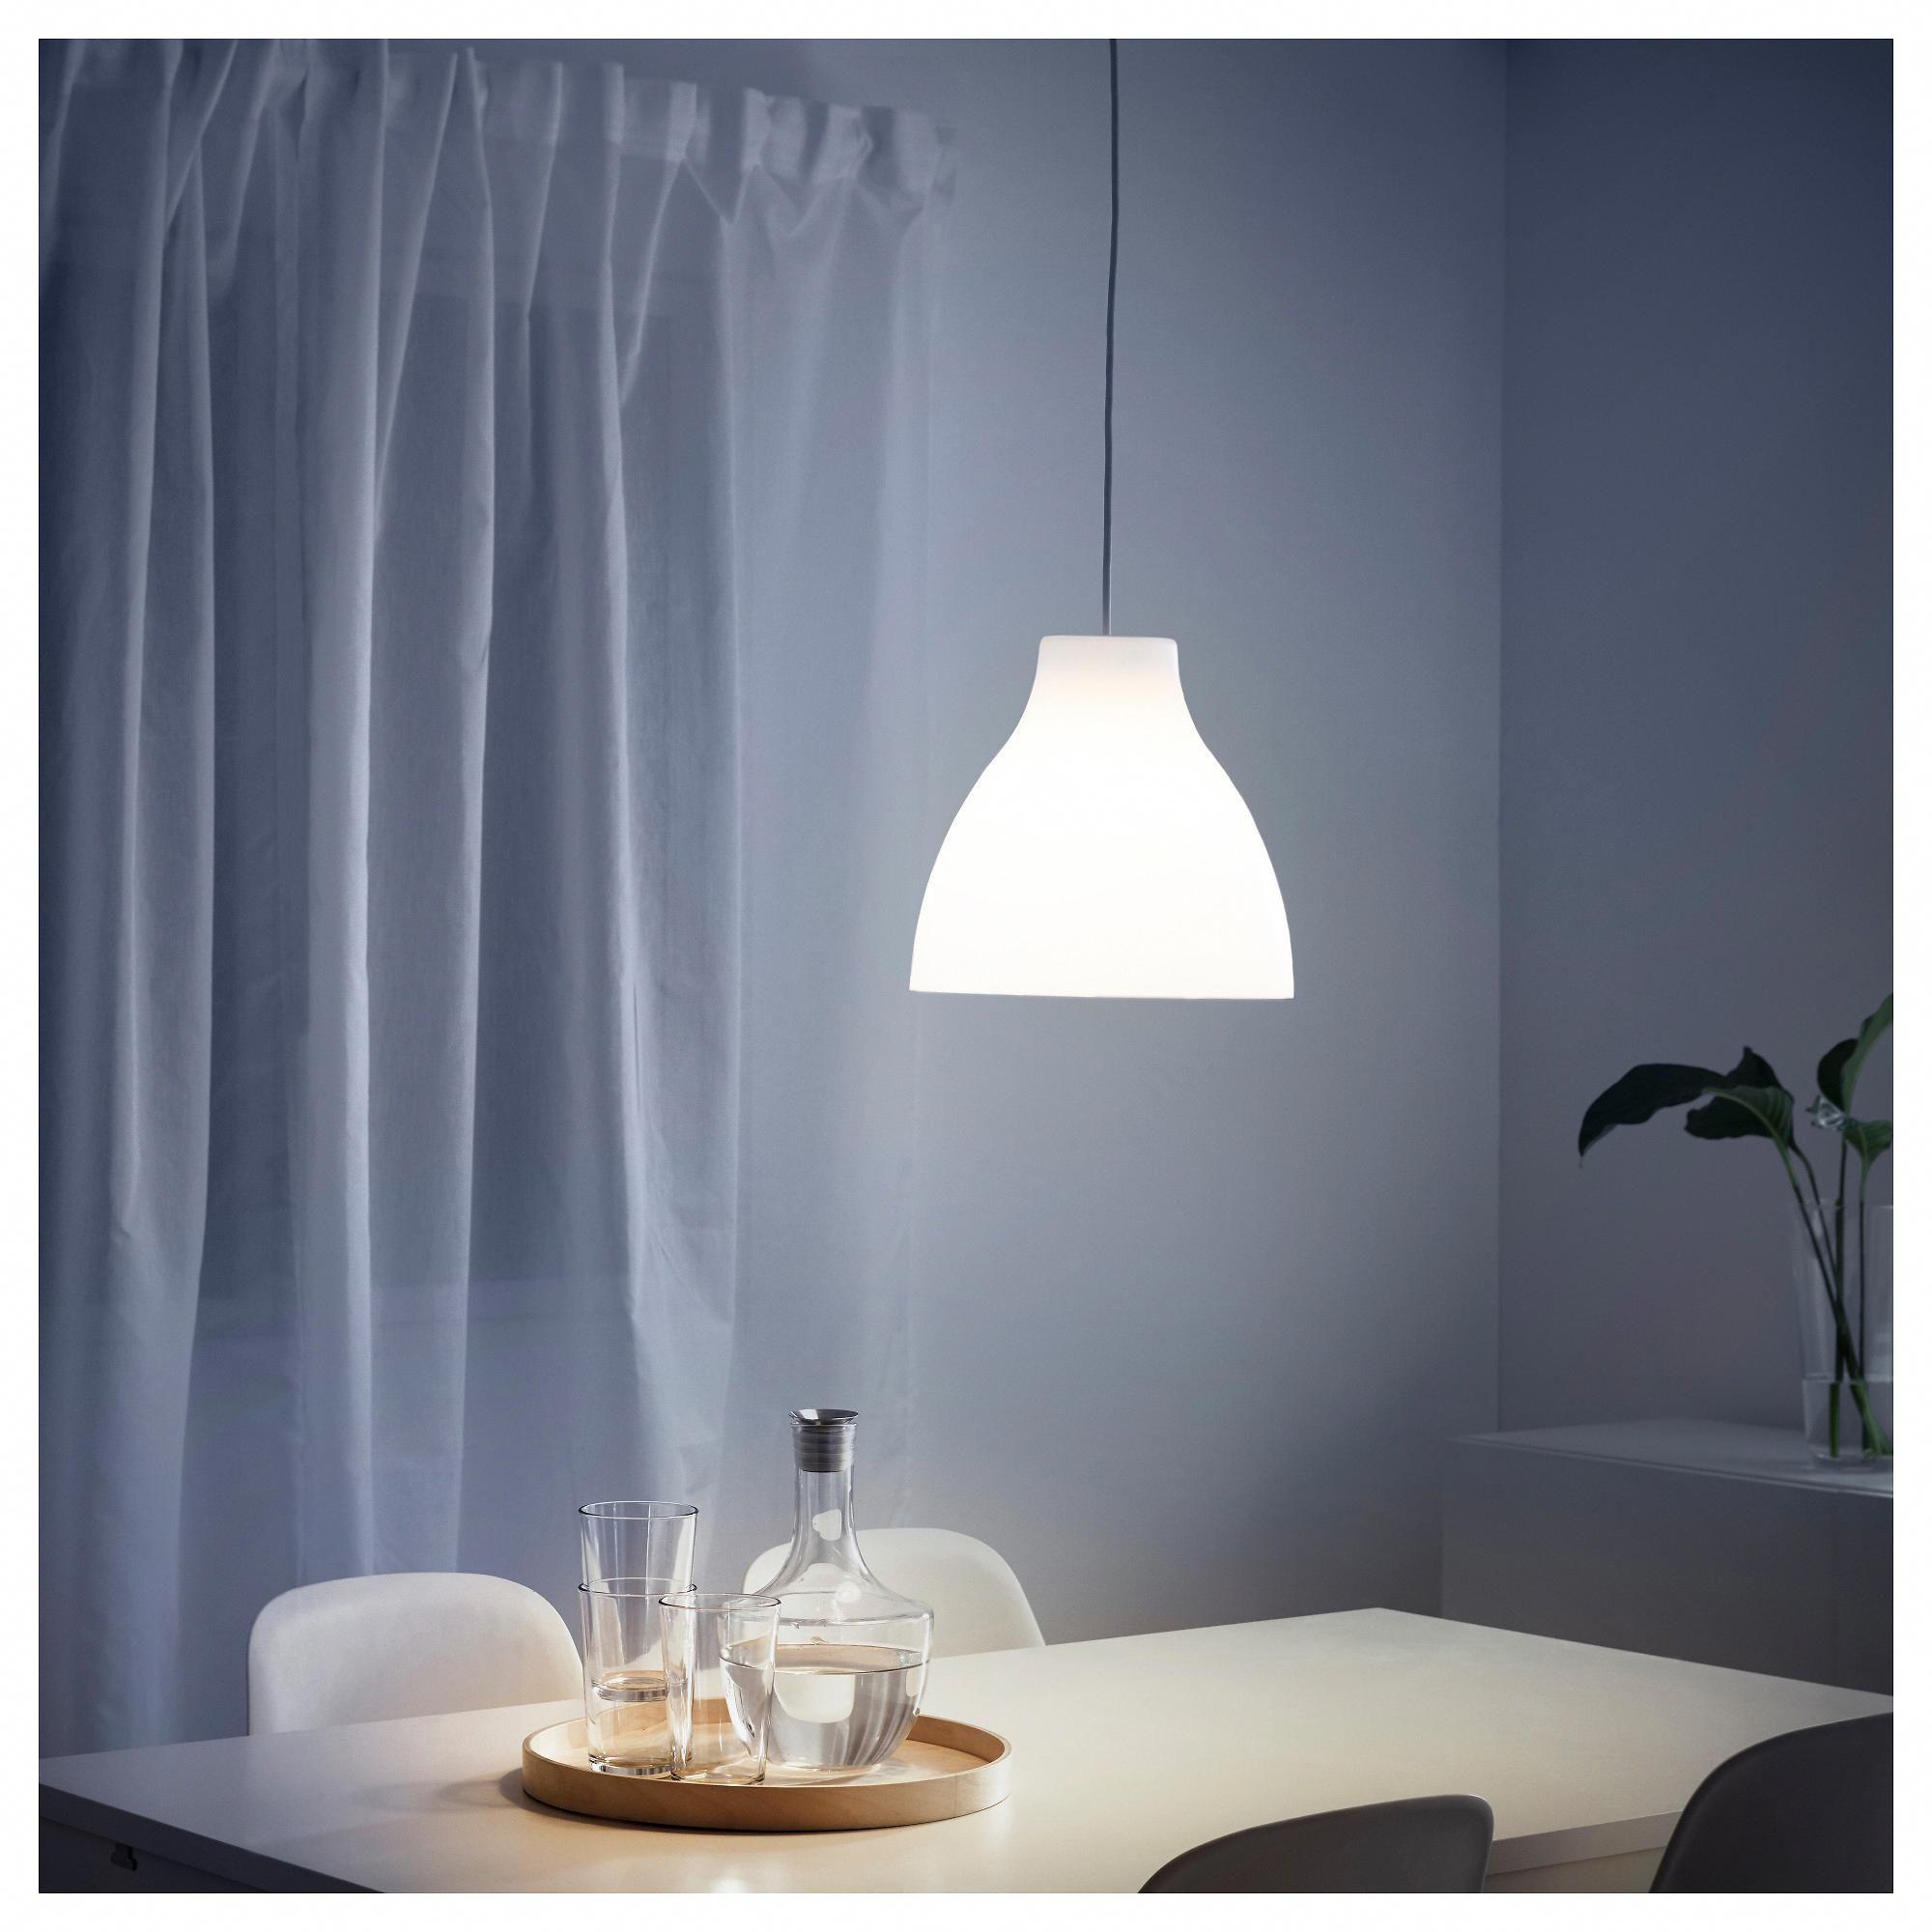 IKEA MELODI Pendant lamp white shabbychiclamp White